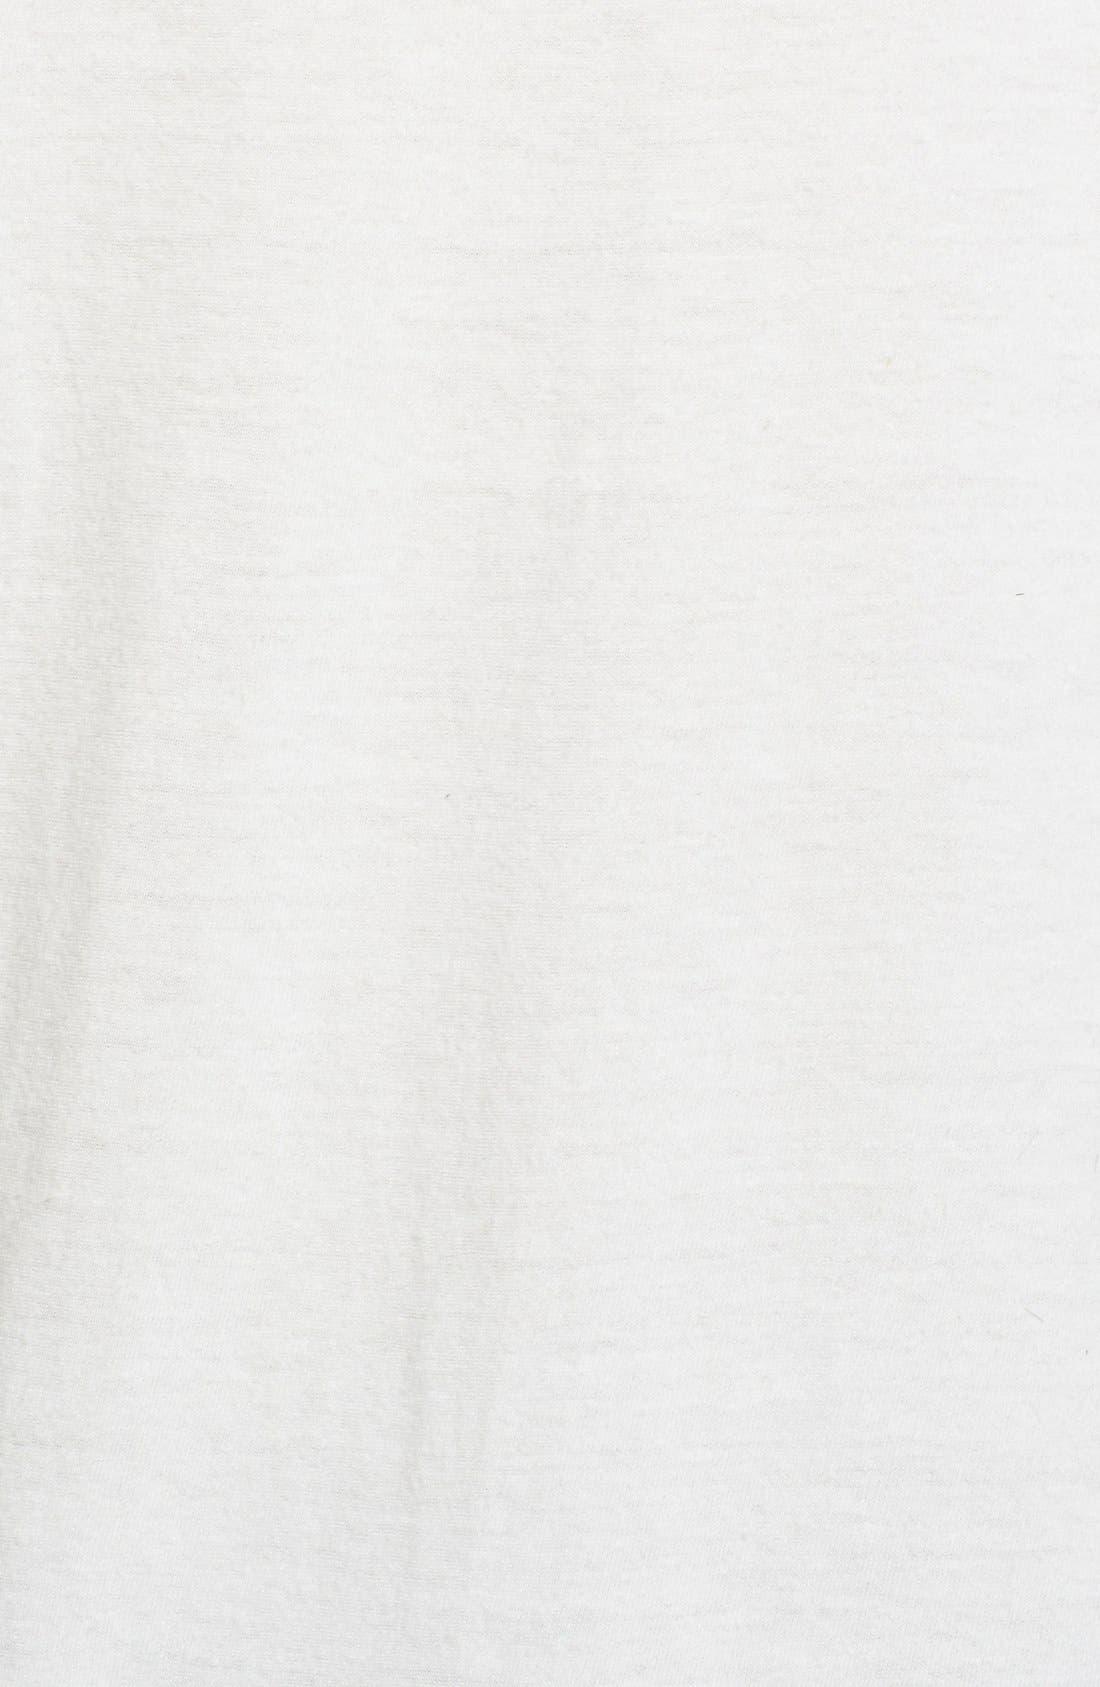 'Houston Astros - Brass Tacks' T-Shirt,                             Alternate thumbnail 2, color,                             139